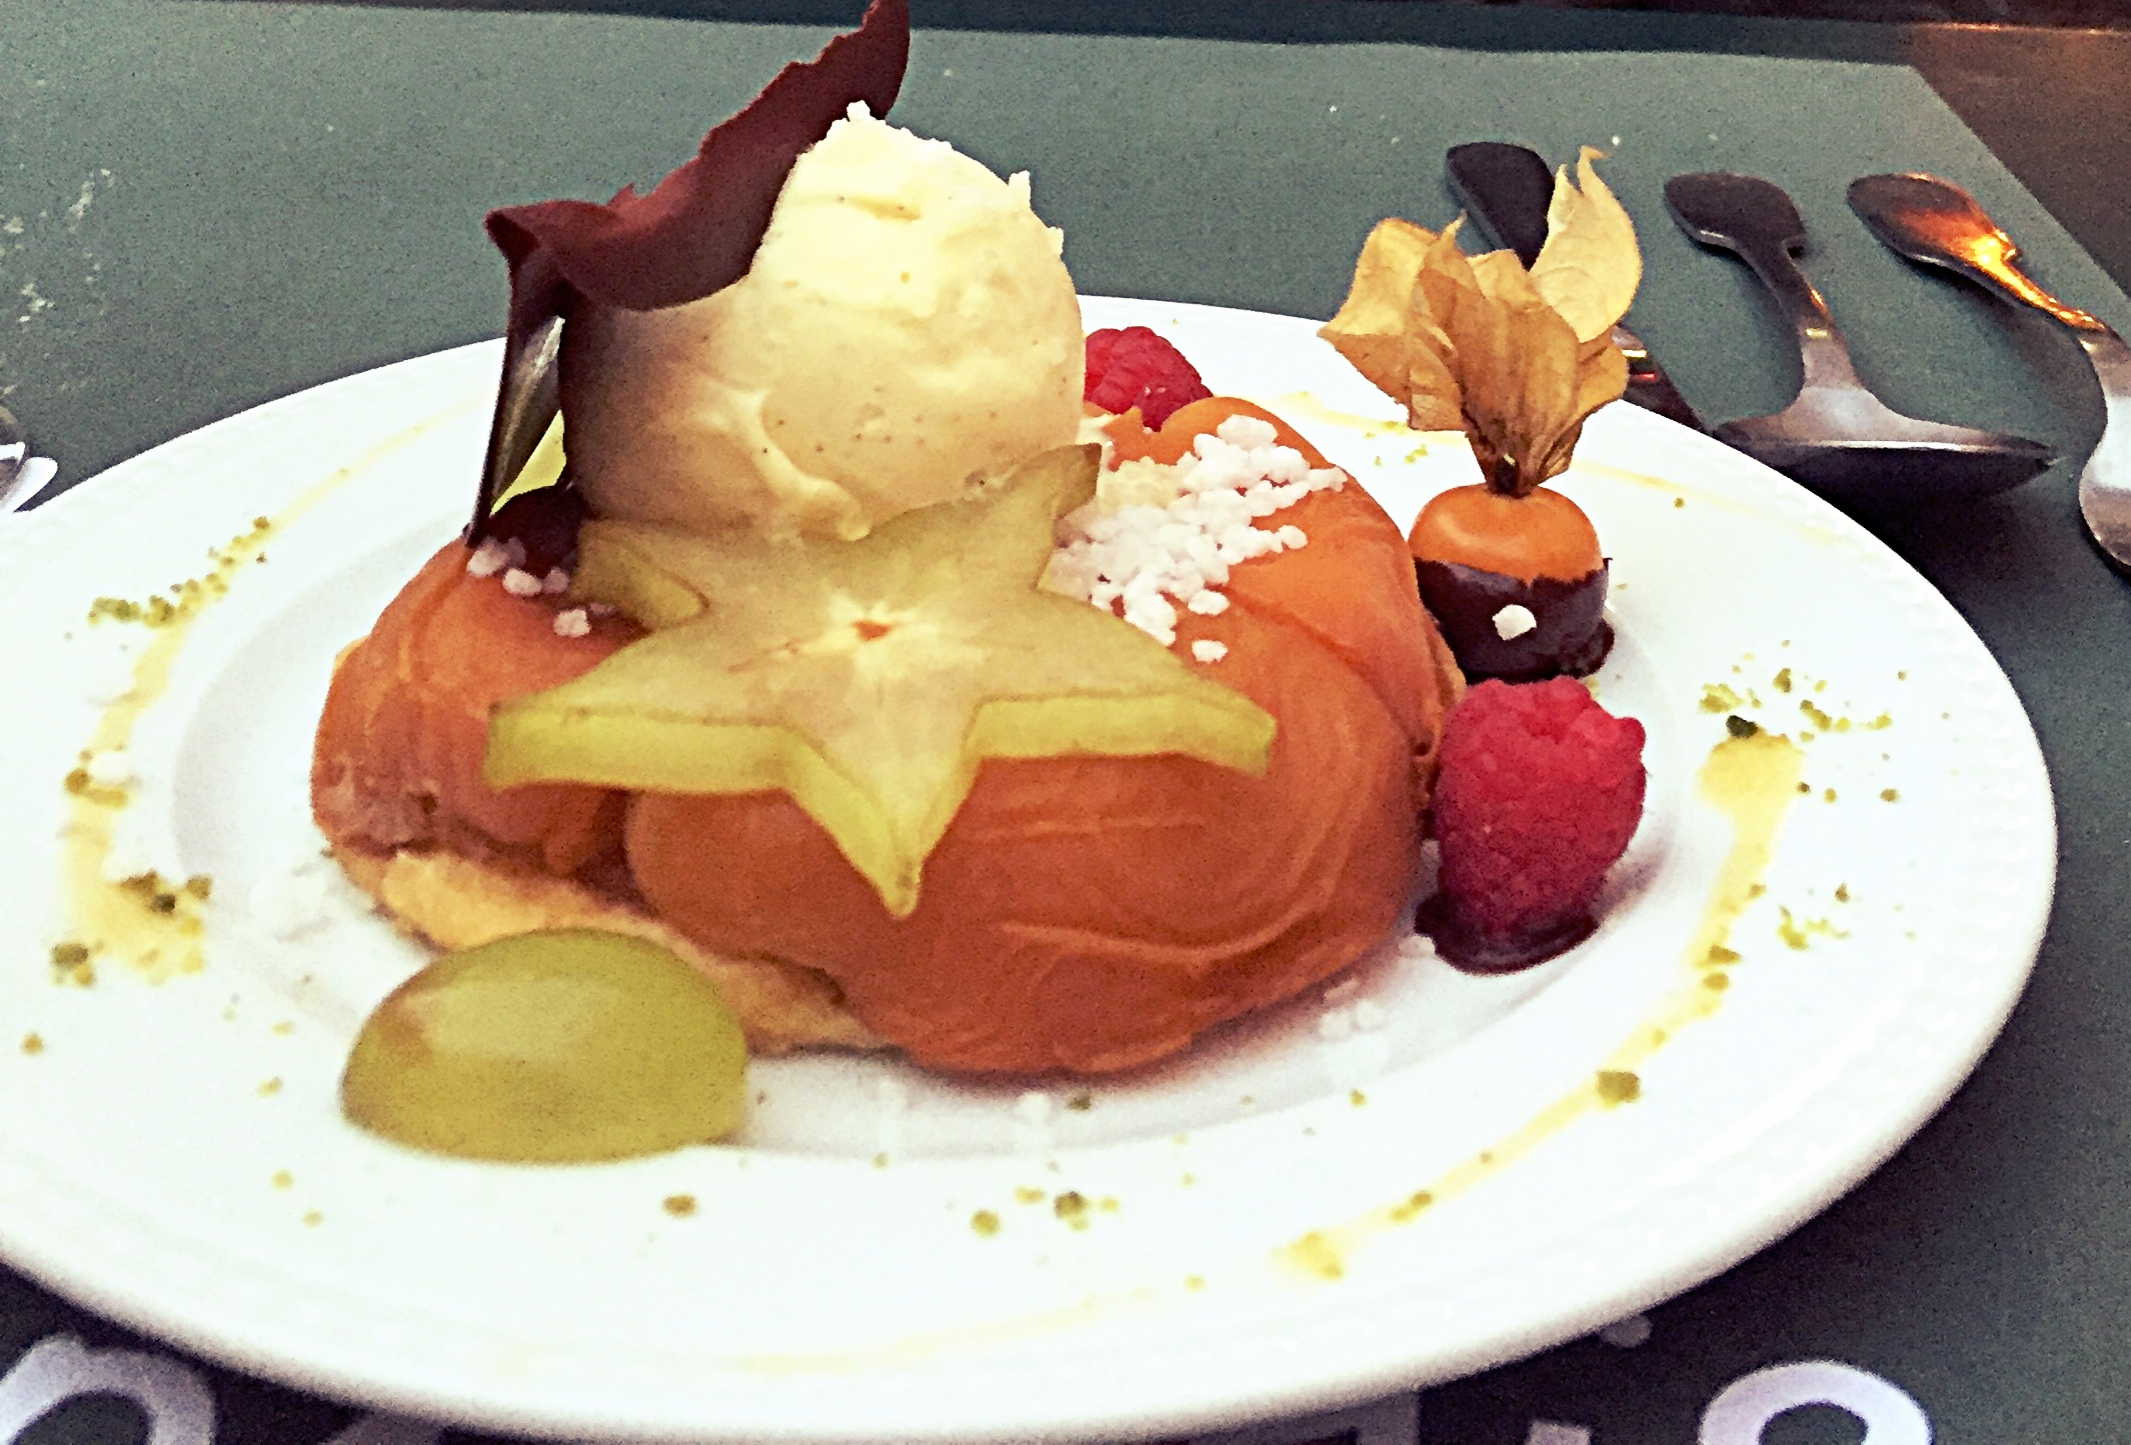 Enjoy French dessert-brush teeth afterwards!